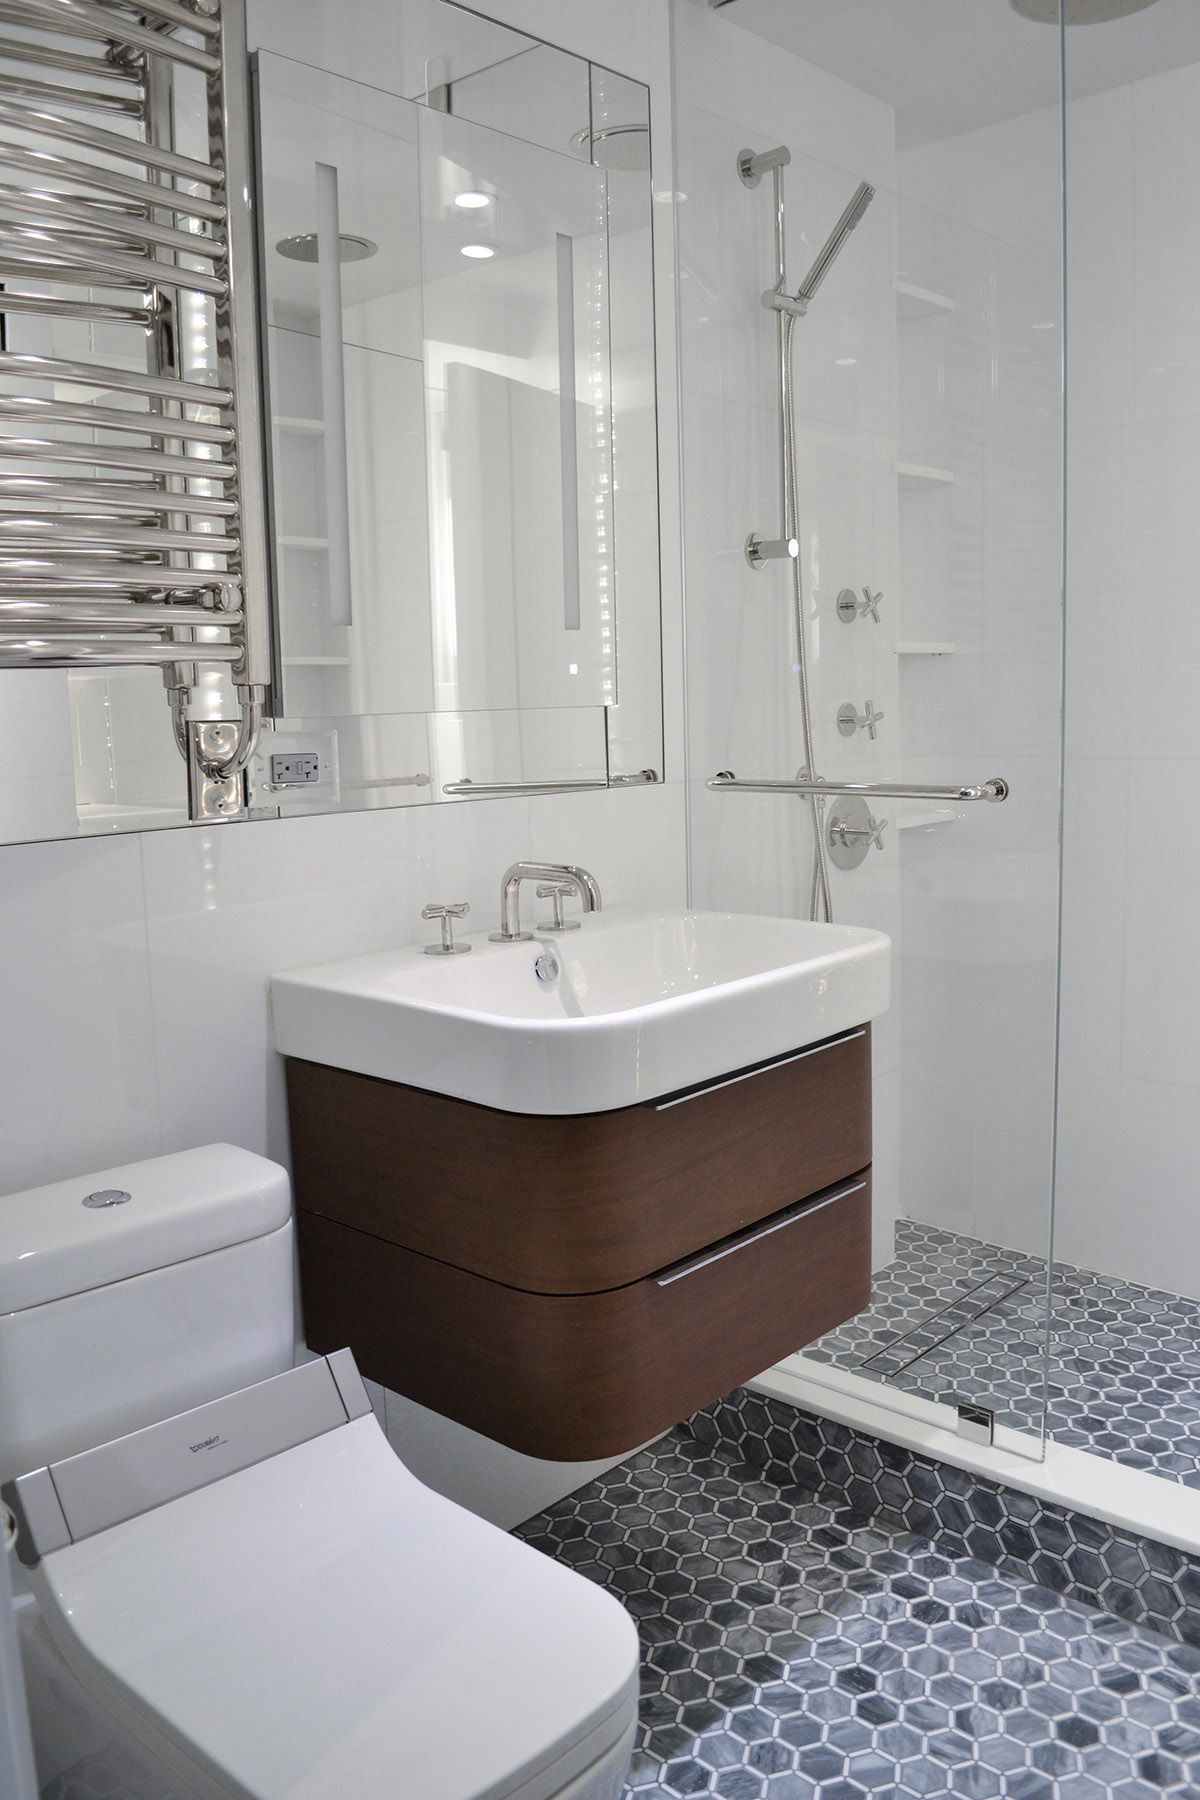 Pin On Bathroom Inspo